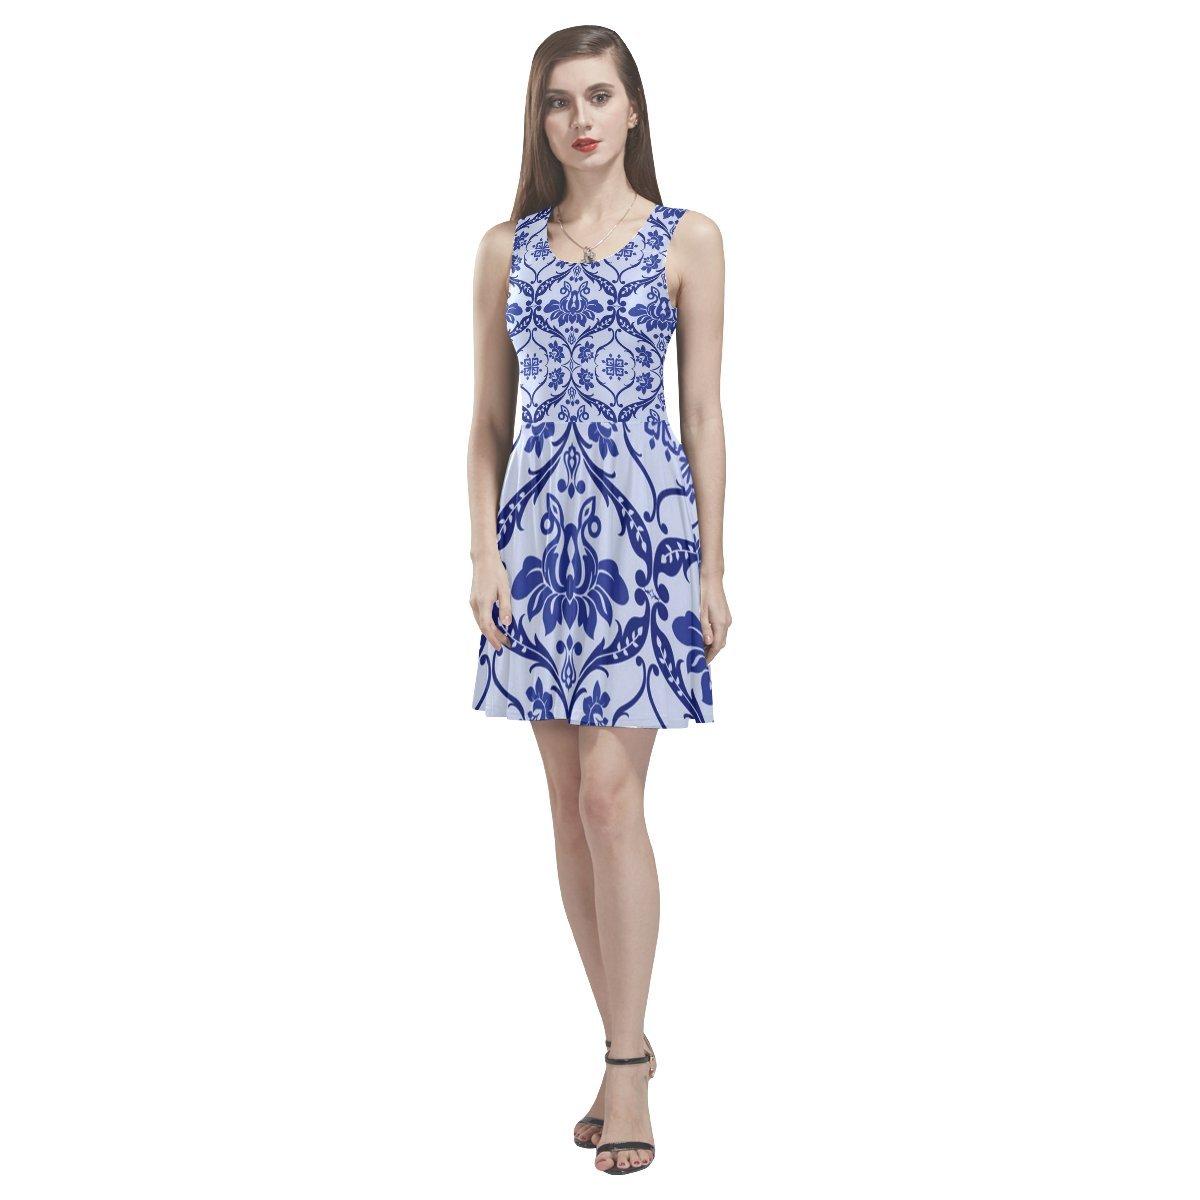 JC-Dress Sleeveless Dress Blue and White Flower Party Beach Skater Dress